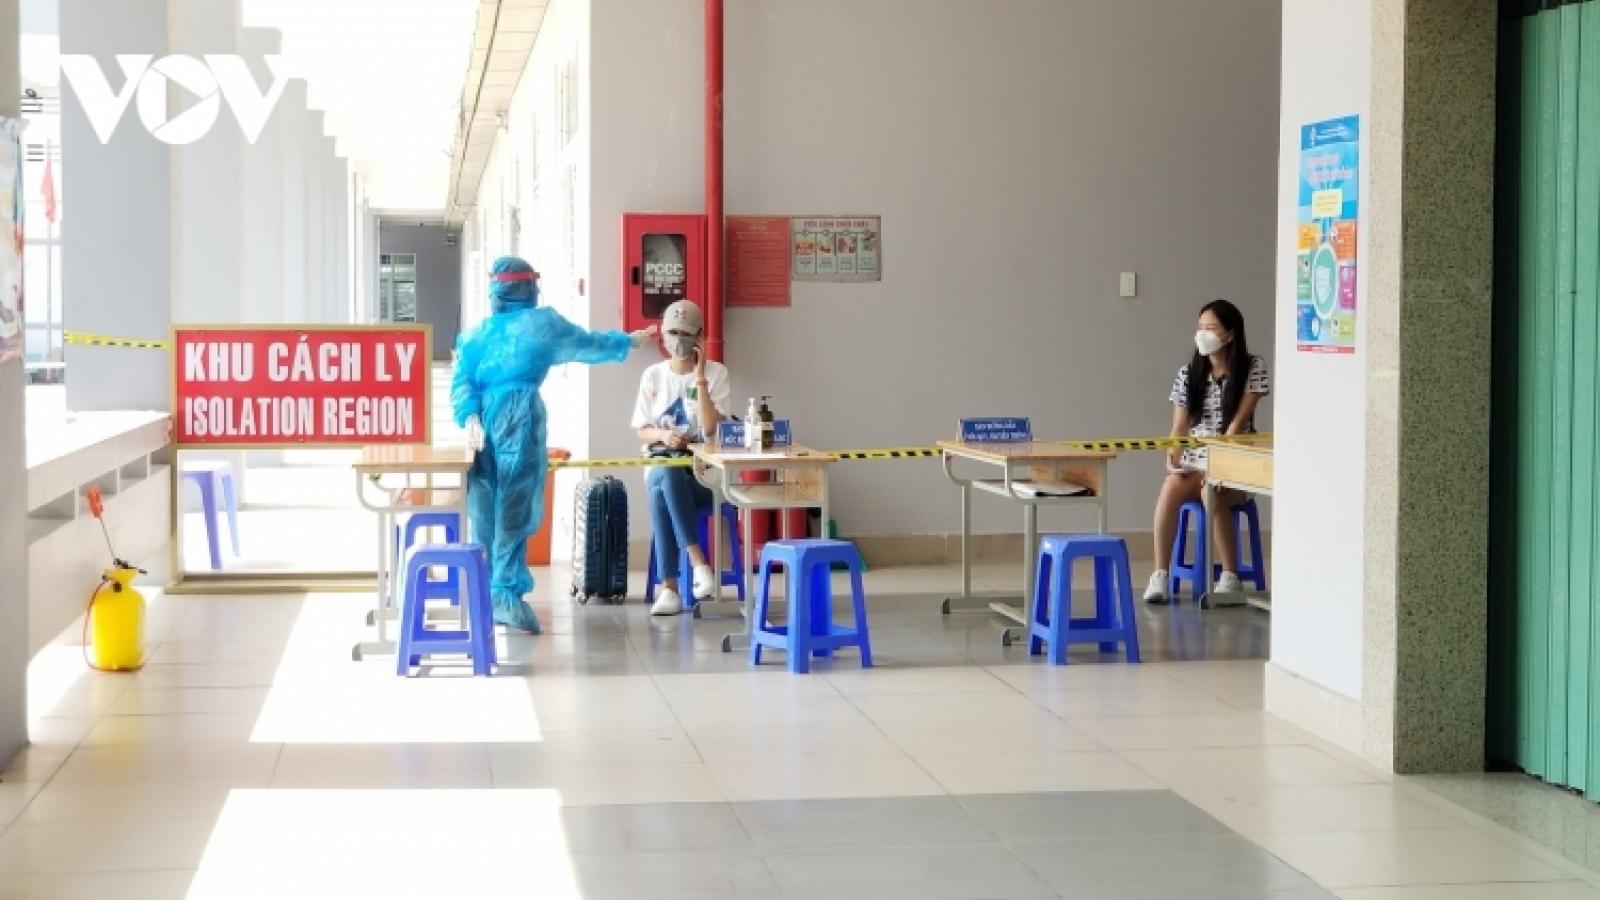 HCM City to tighten social distancing measures as COVID-19 cases skyrocket